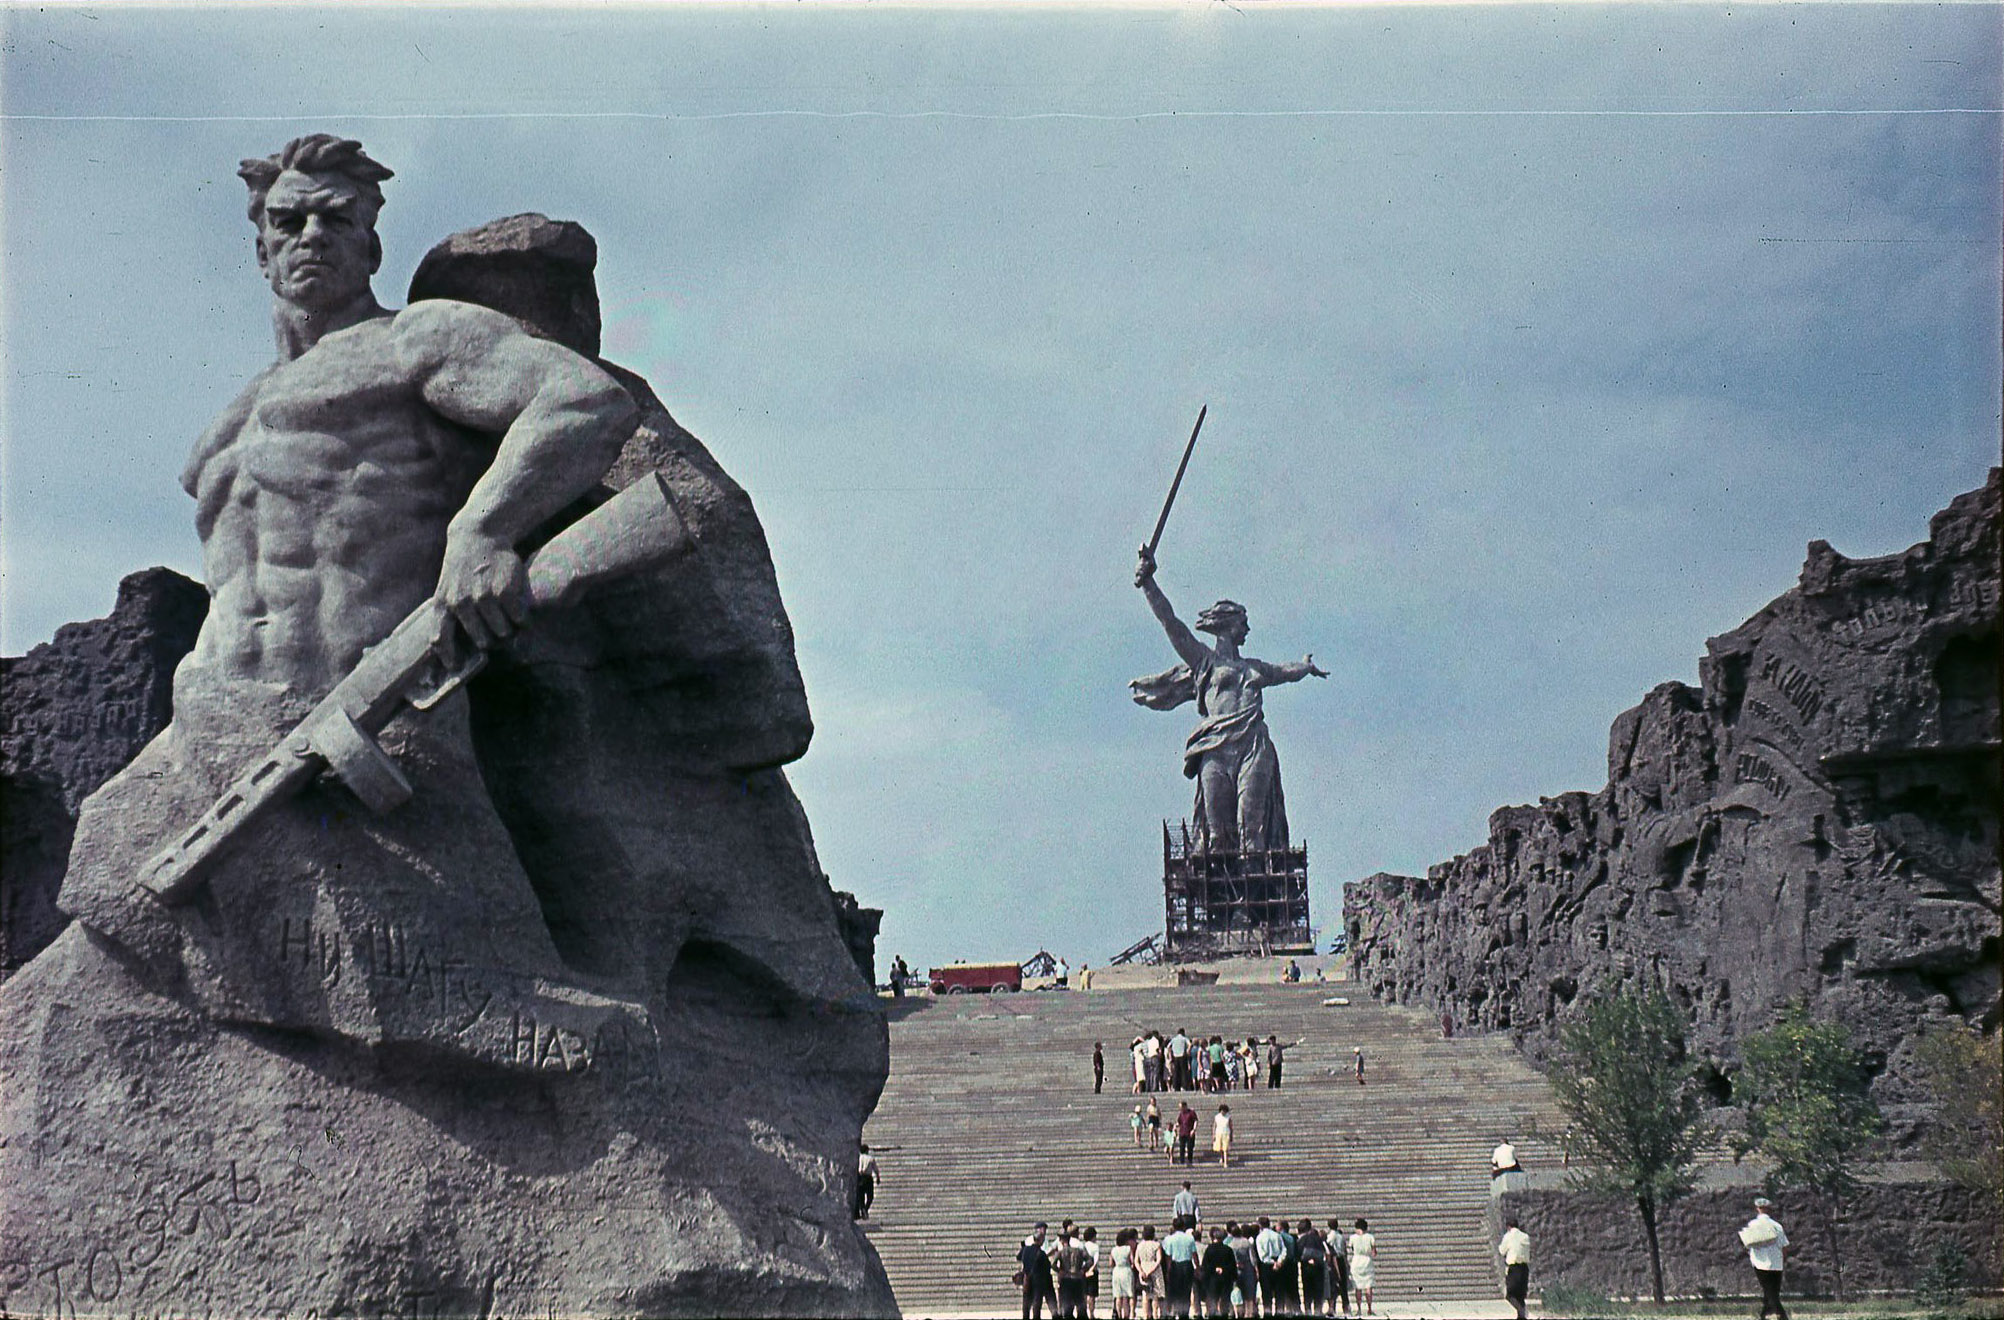 Волгоград. Строительство мемориала «Мамаев курган»